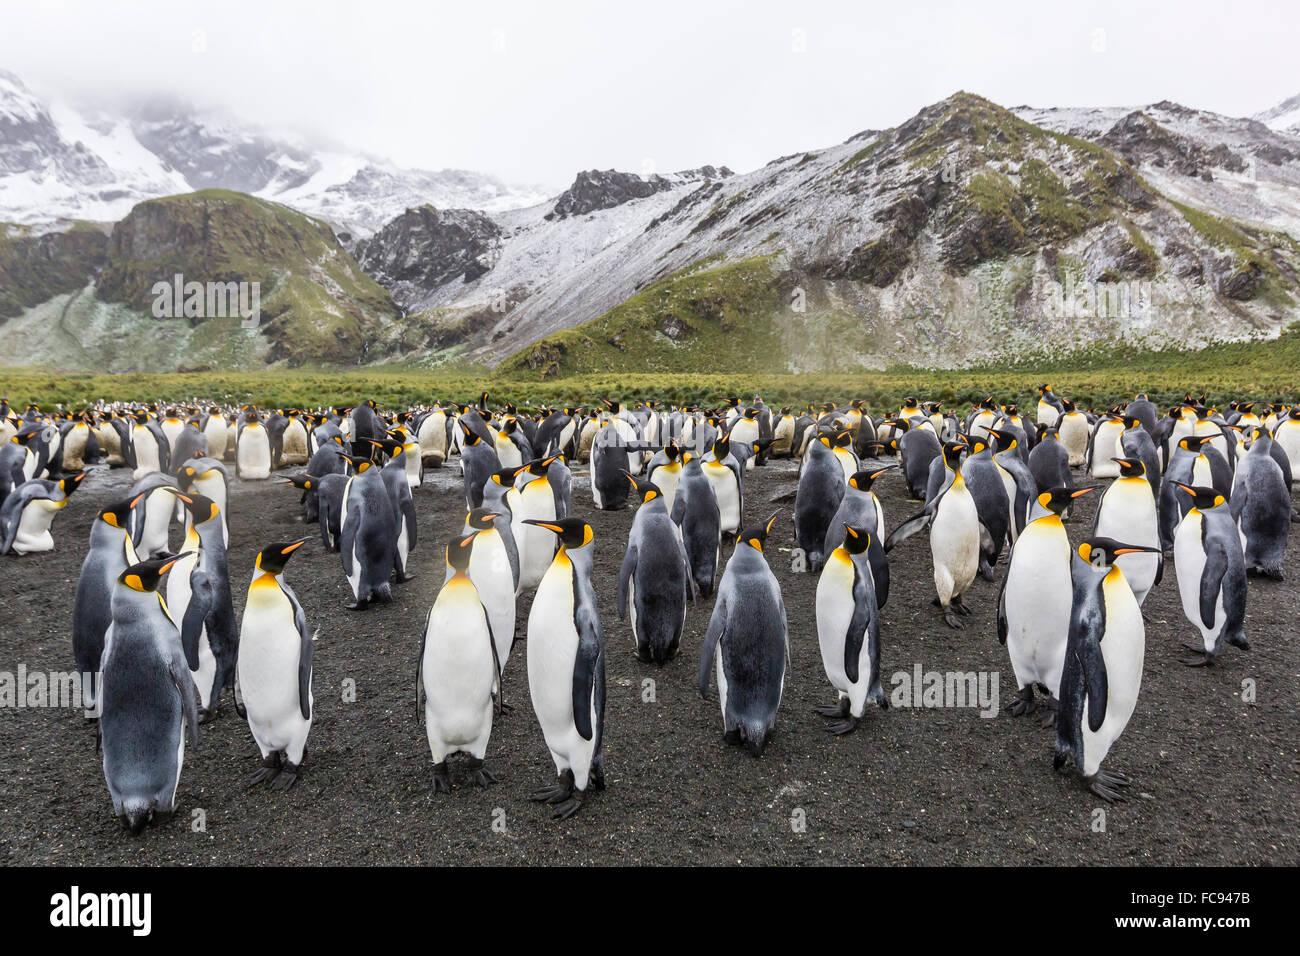 King penguins (Aptenodytes patagonicus), breeding colony at Gold Harbour, South Georgia, Polar Regions - Stock Image